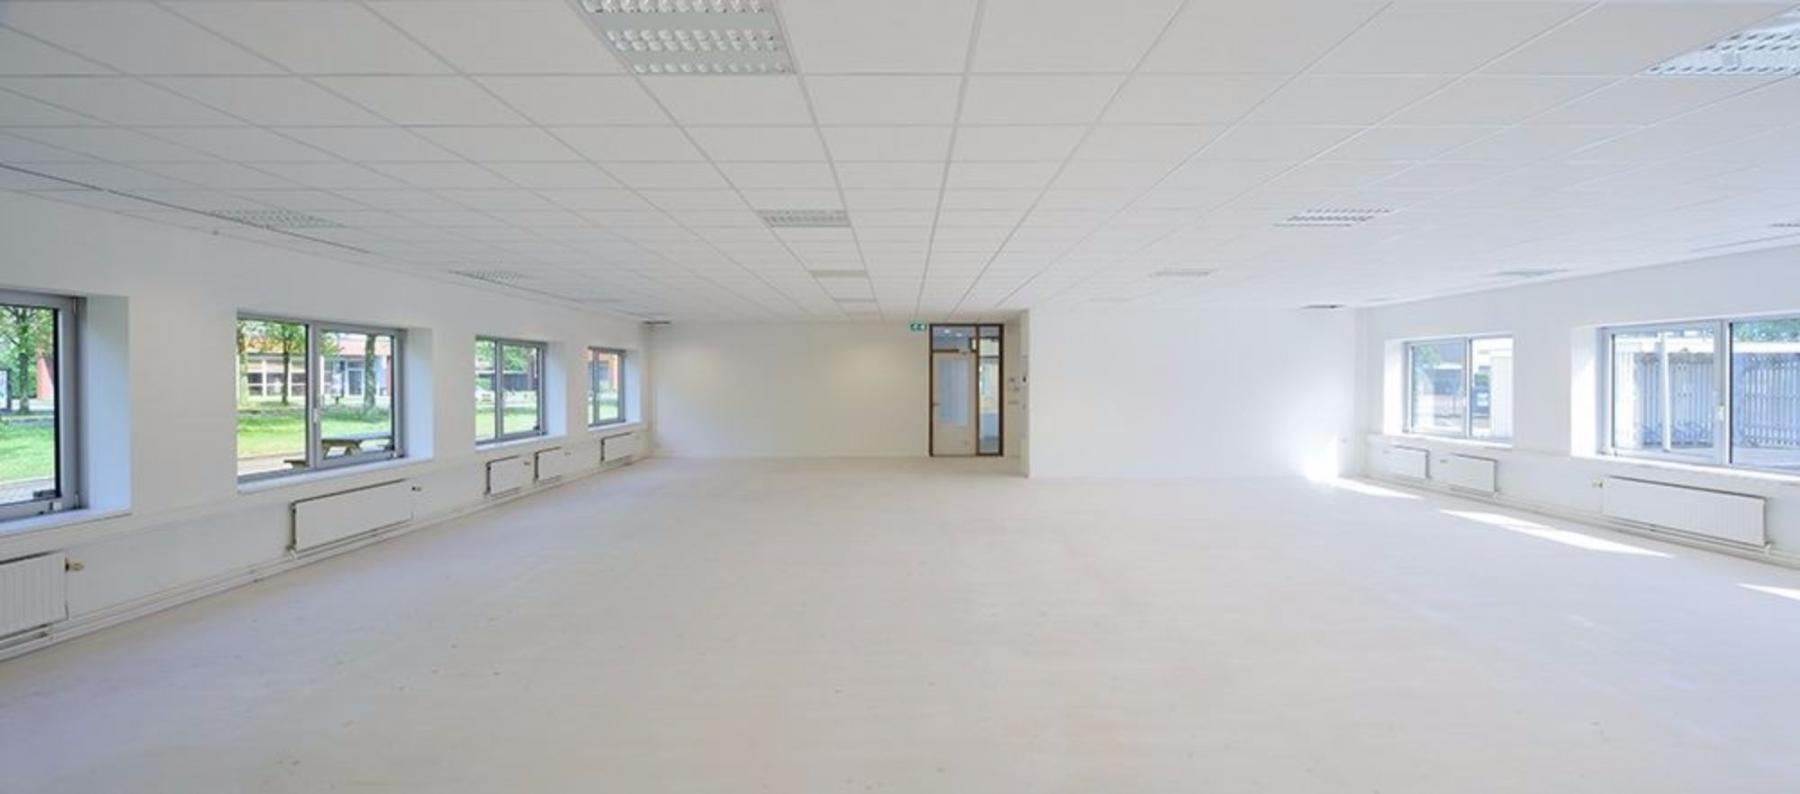 Empty office space for rent in Houten